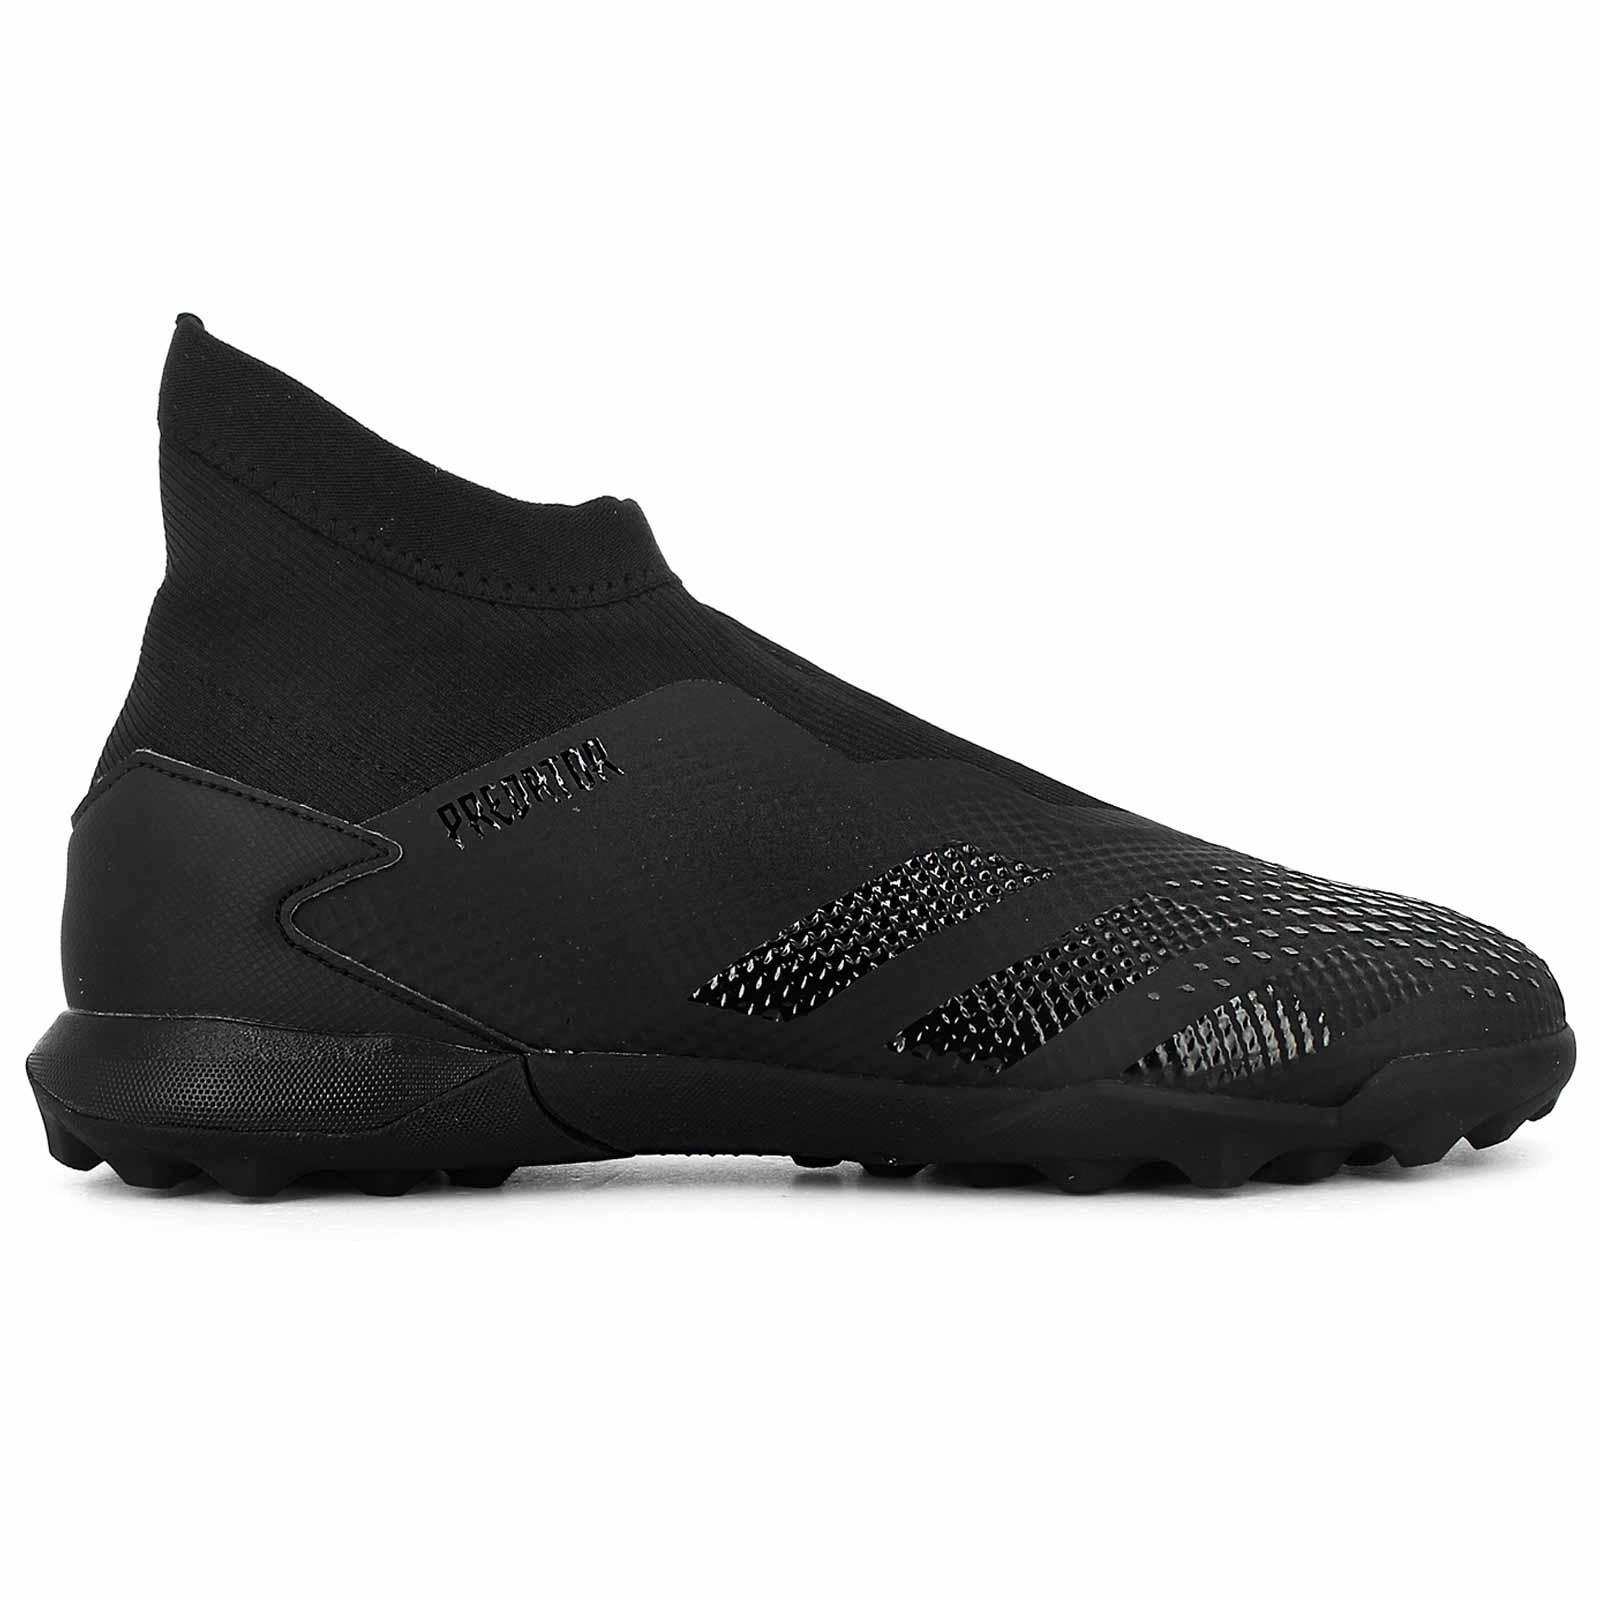 Zapatillas adidas Predator 20.3 LL TF negras | futbolmania